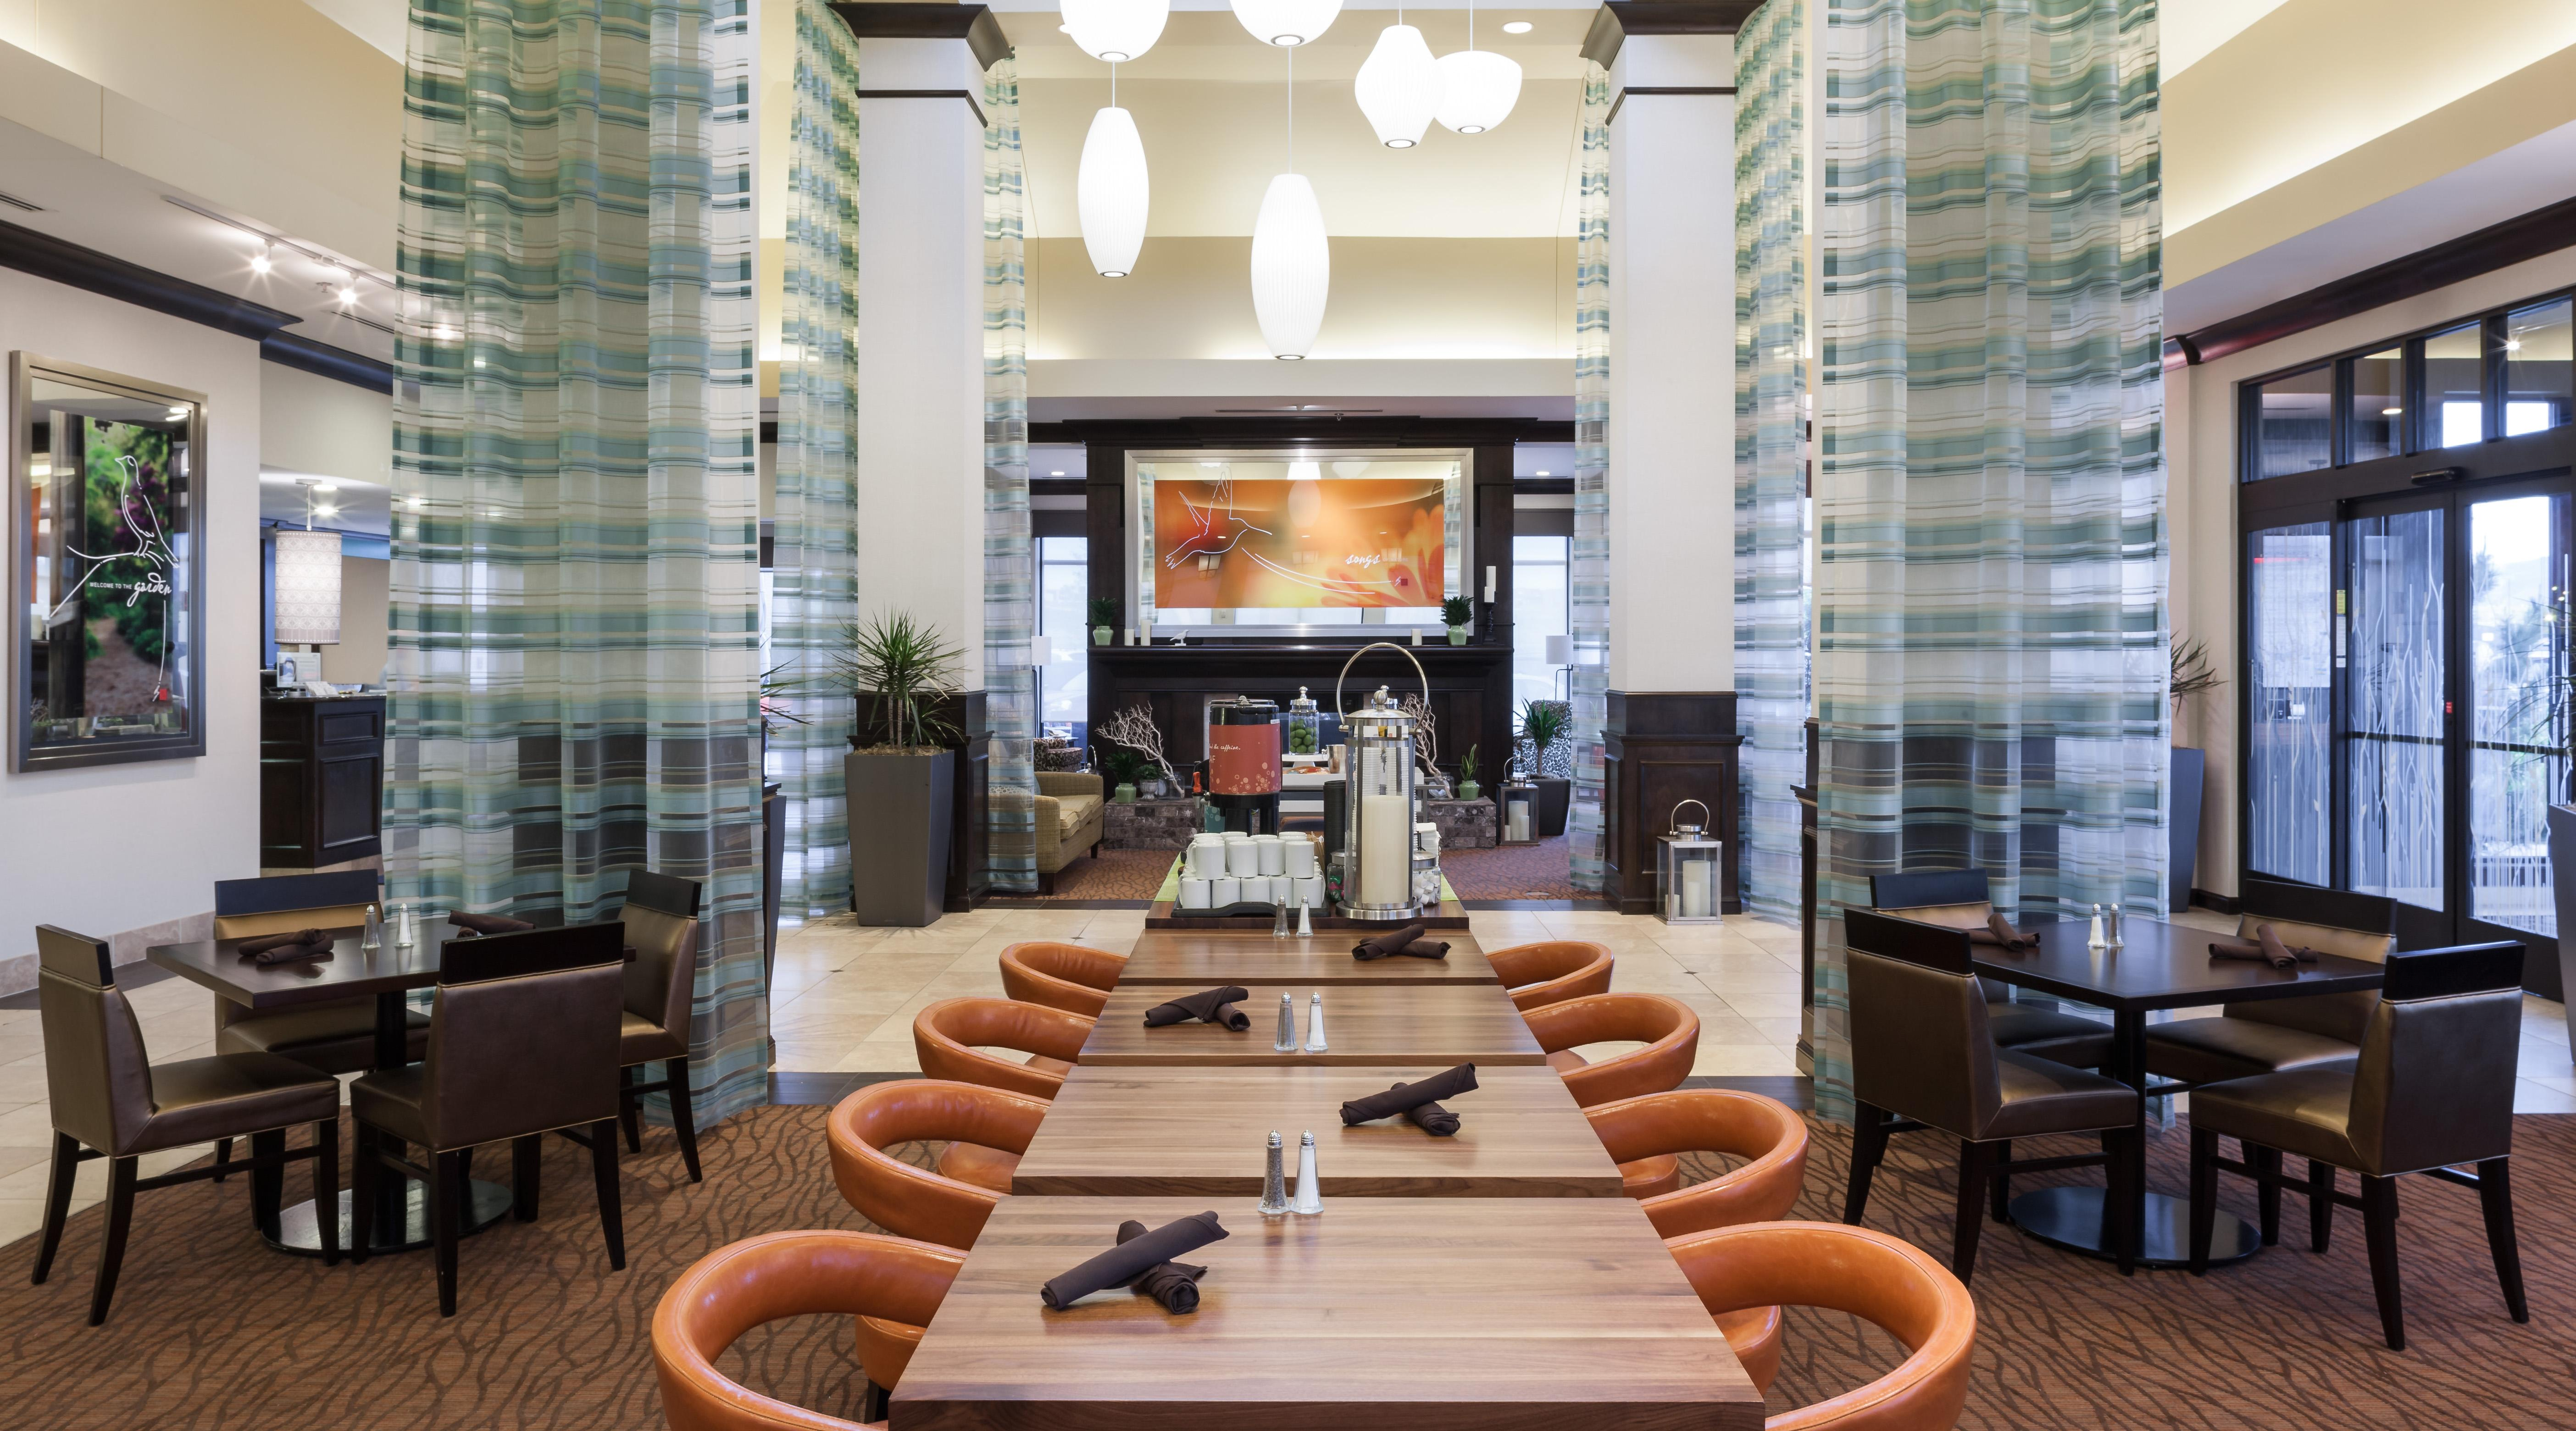 Venue Coordinator Luncheon at Hilton Garden Inn Highlands Ranch